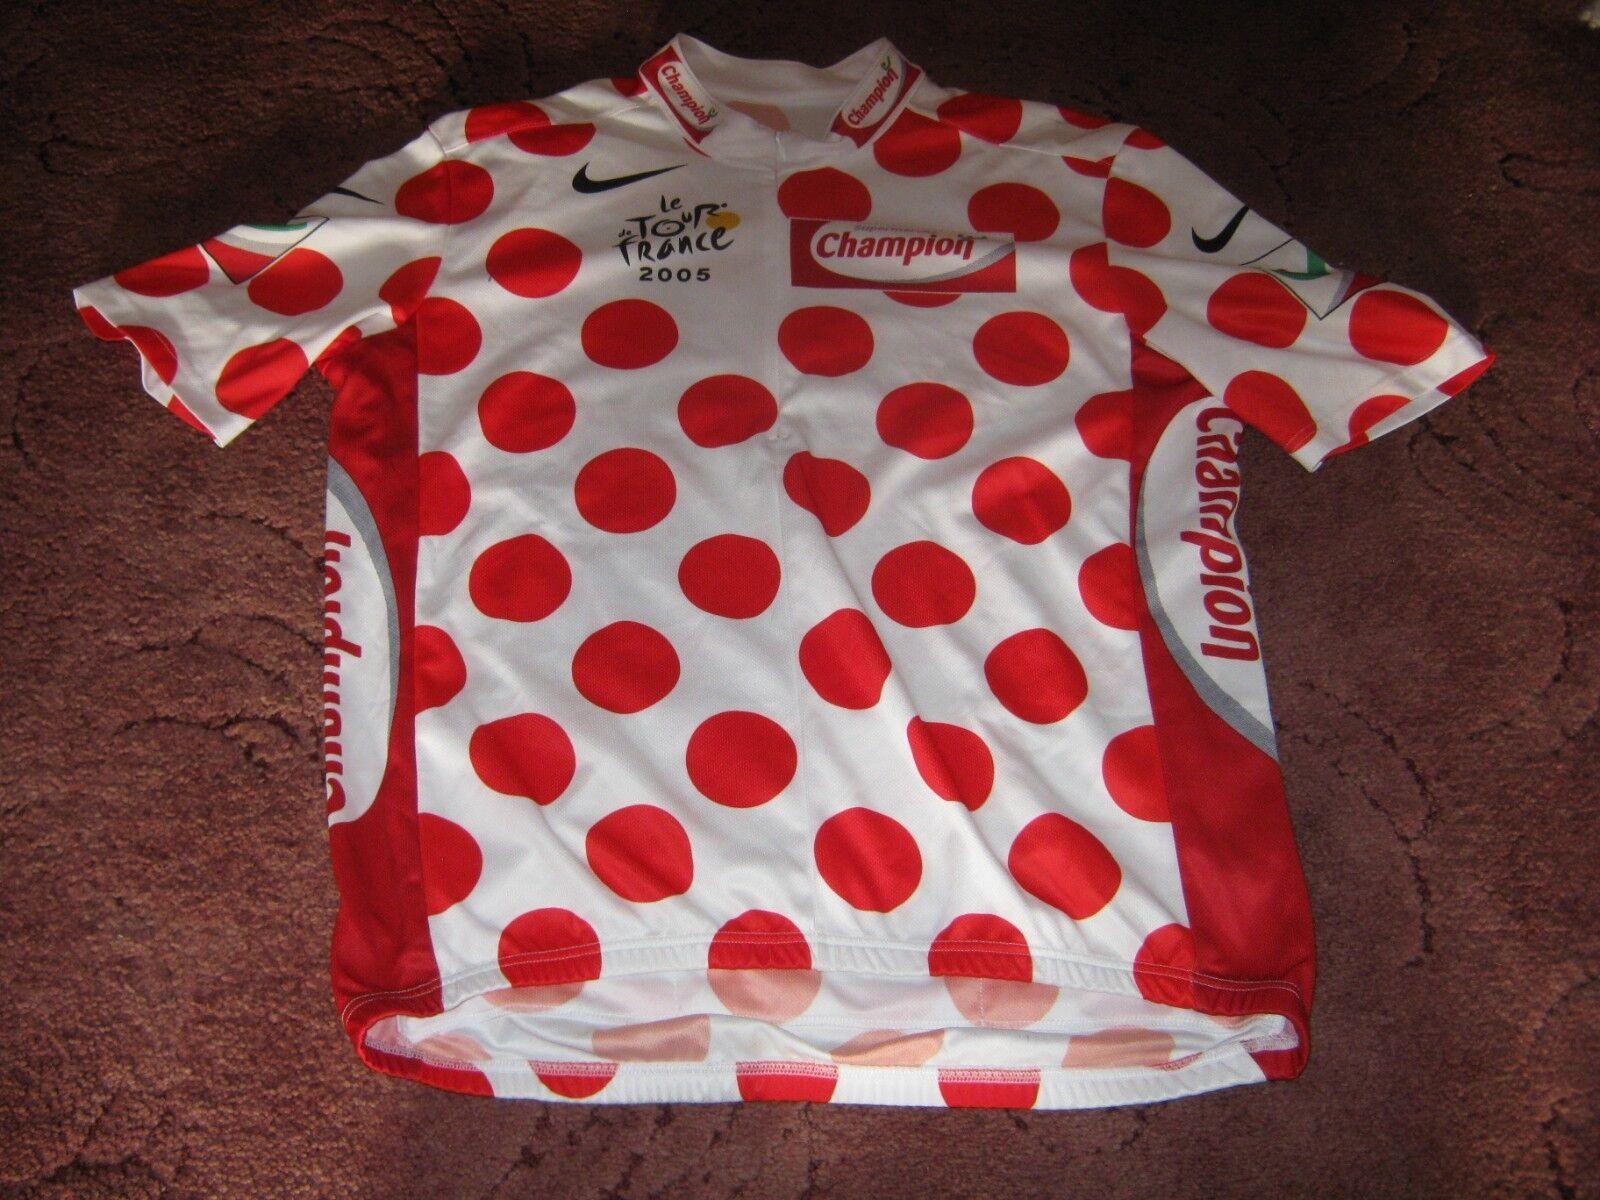 TOUR DE FRANCE 2005 POLKA DOT KOM NIKE  ITALIAN CYCLING JERSEY [XXL]  shop online today